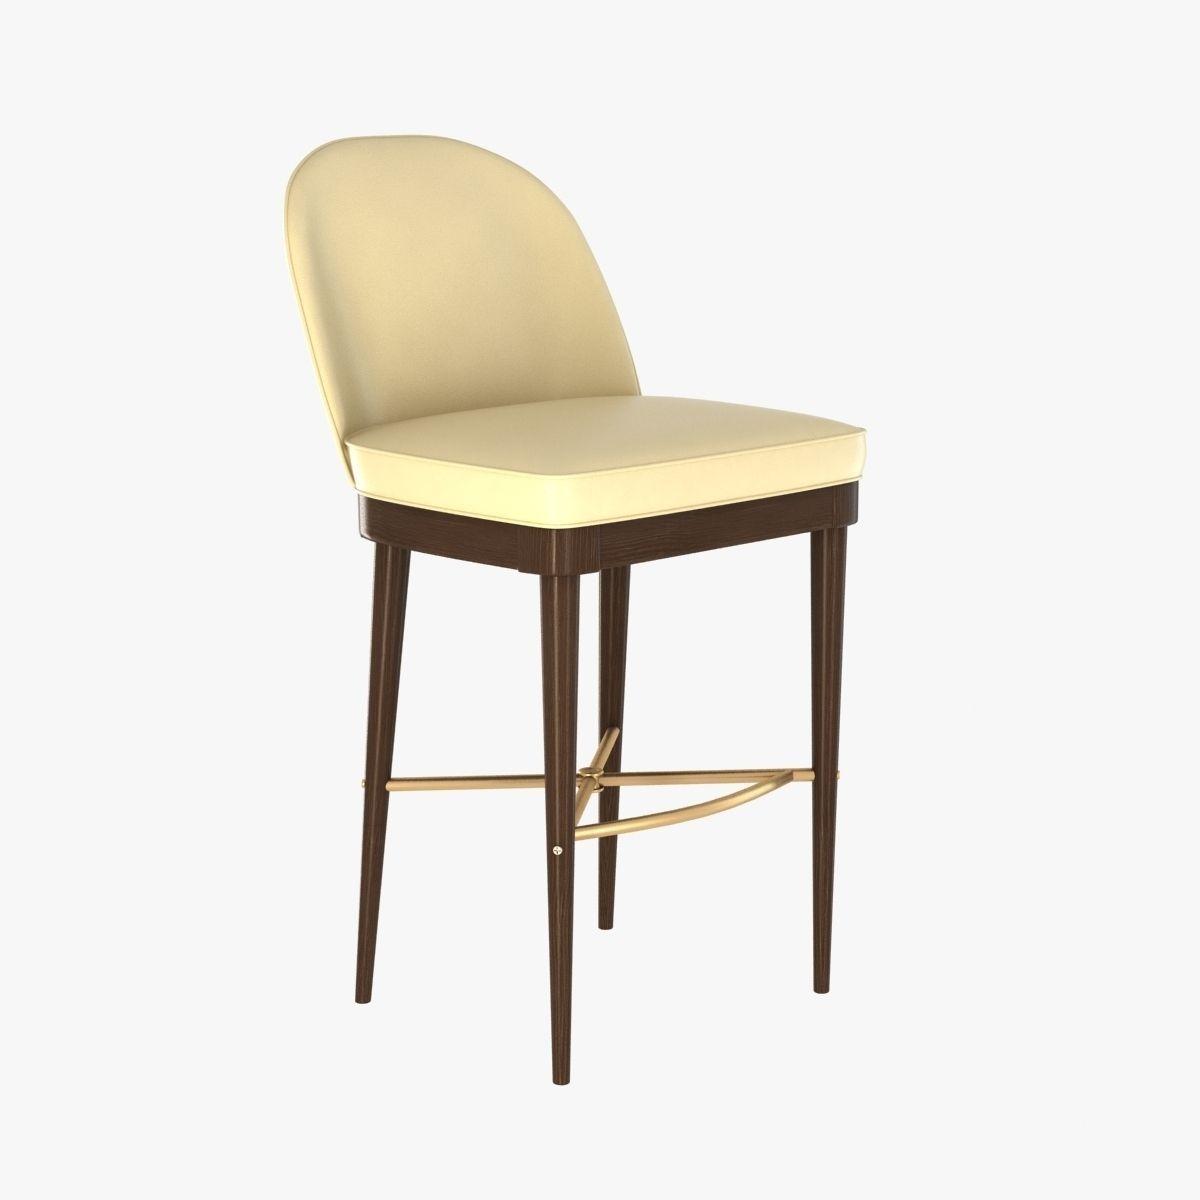 Astounding Laurent Bar Stool By Hickory Chair Furniture 3D Model Alphanode Cool Chair Designs And Ideas Alphanodeonline